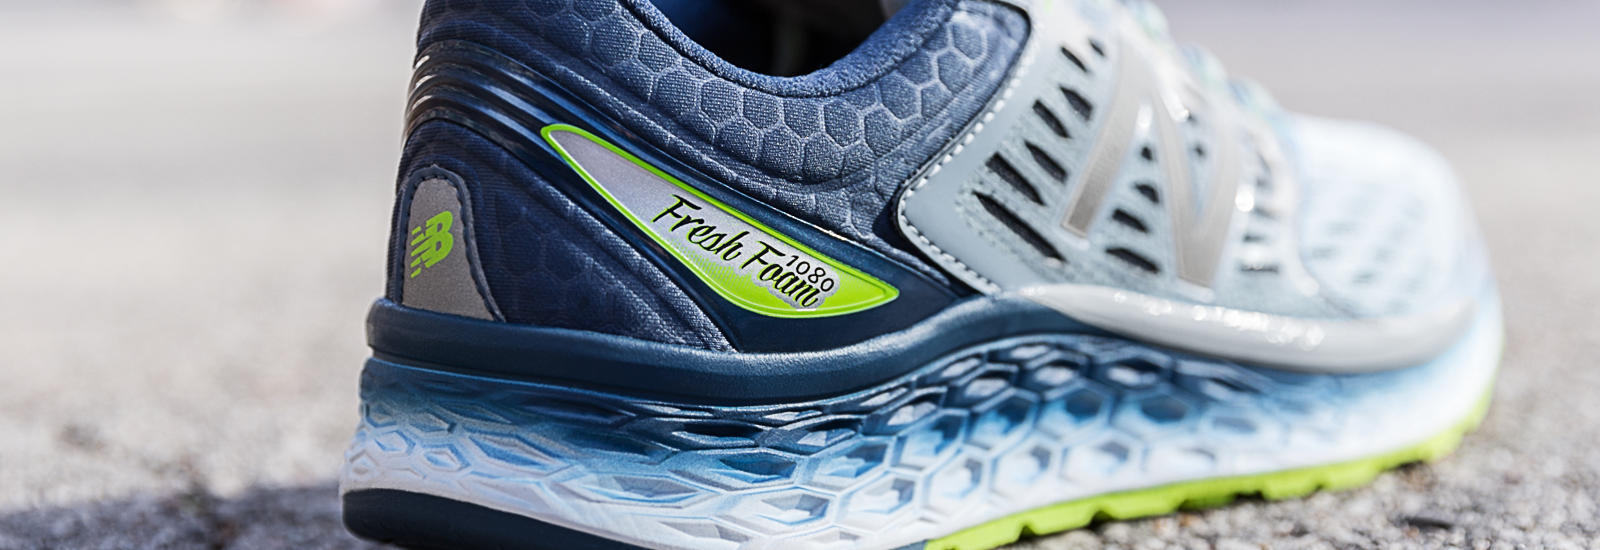 1080 new balance running shoes